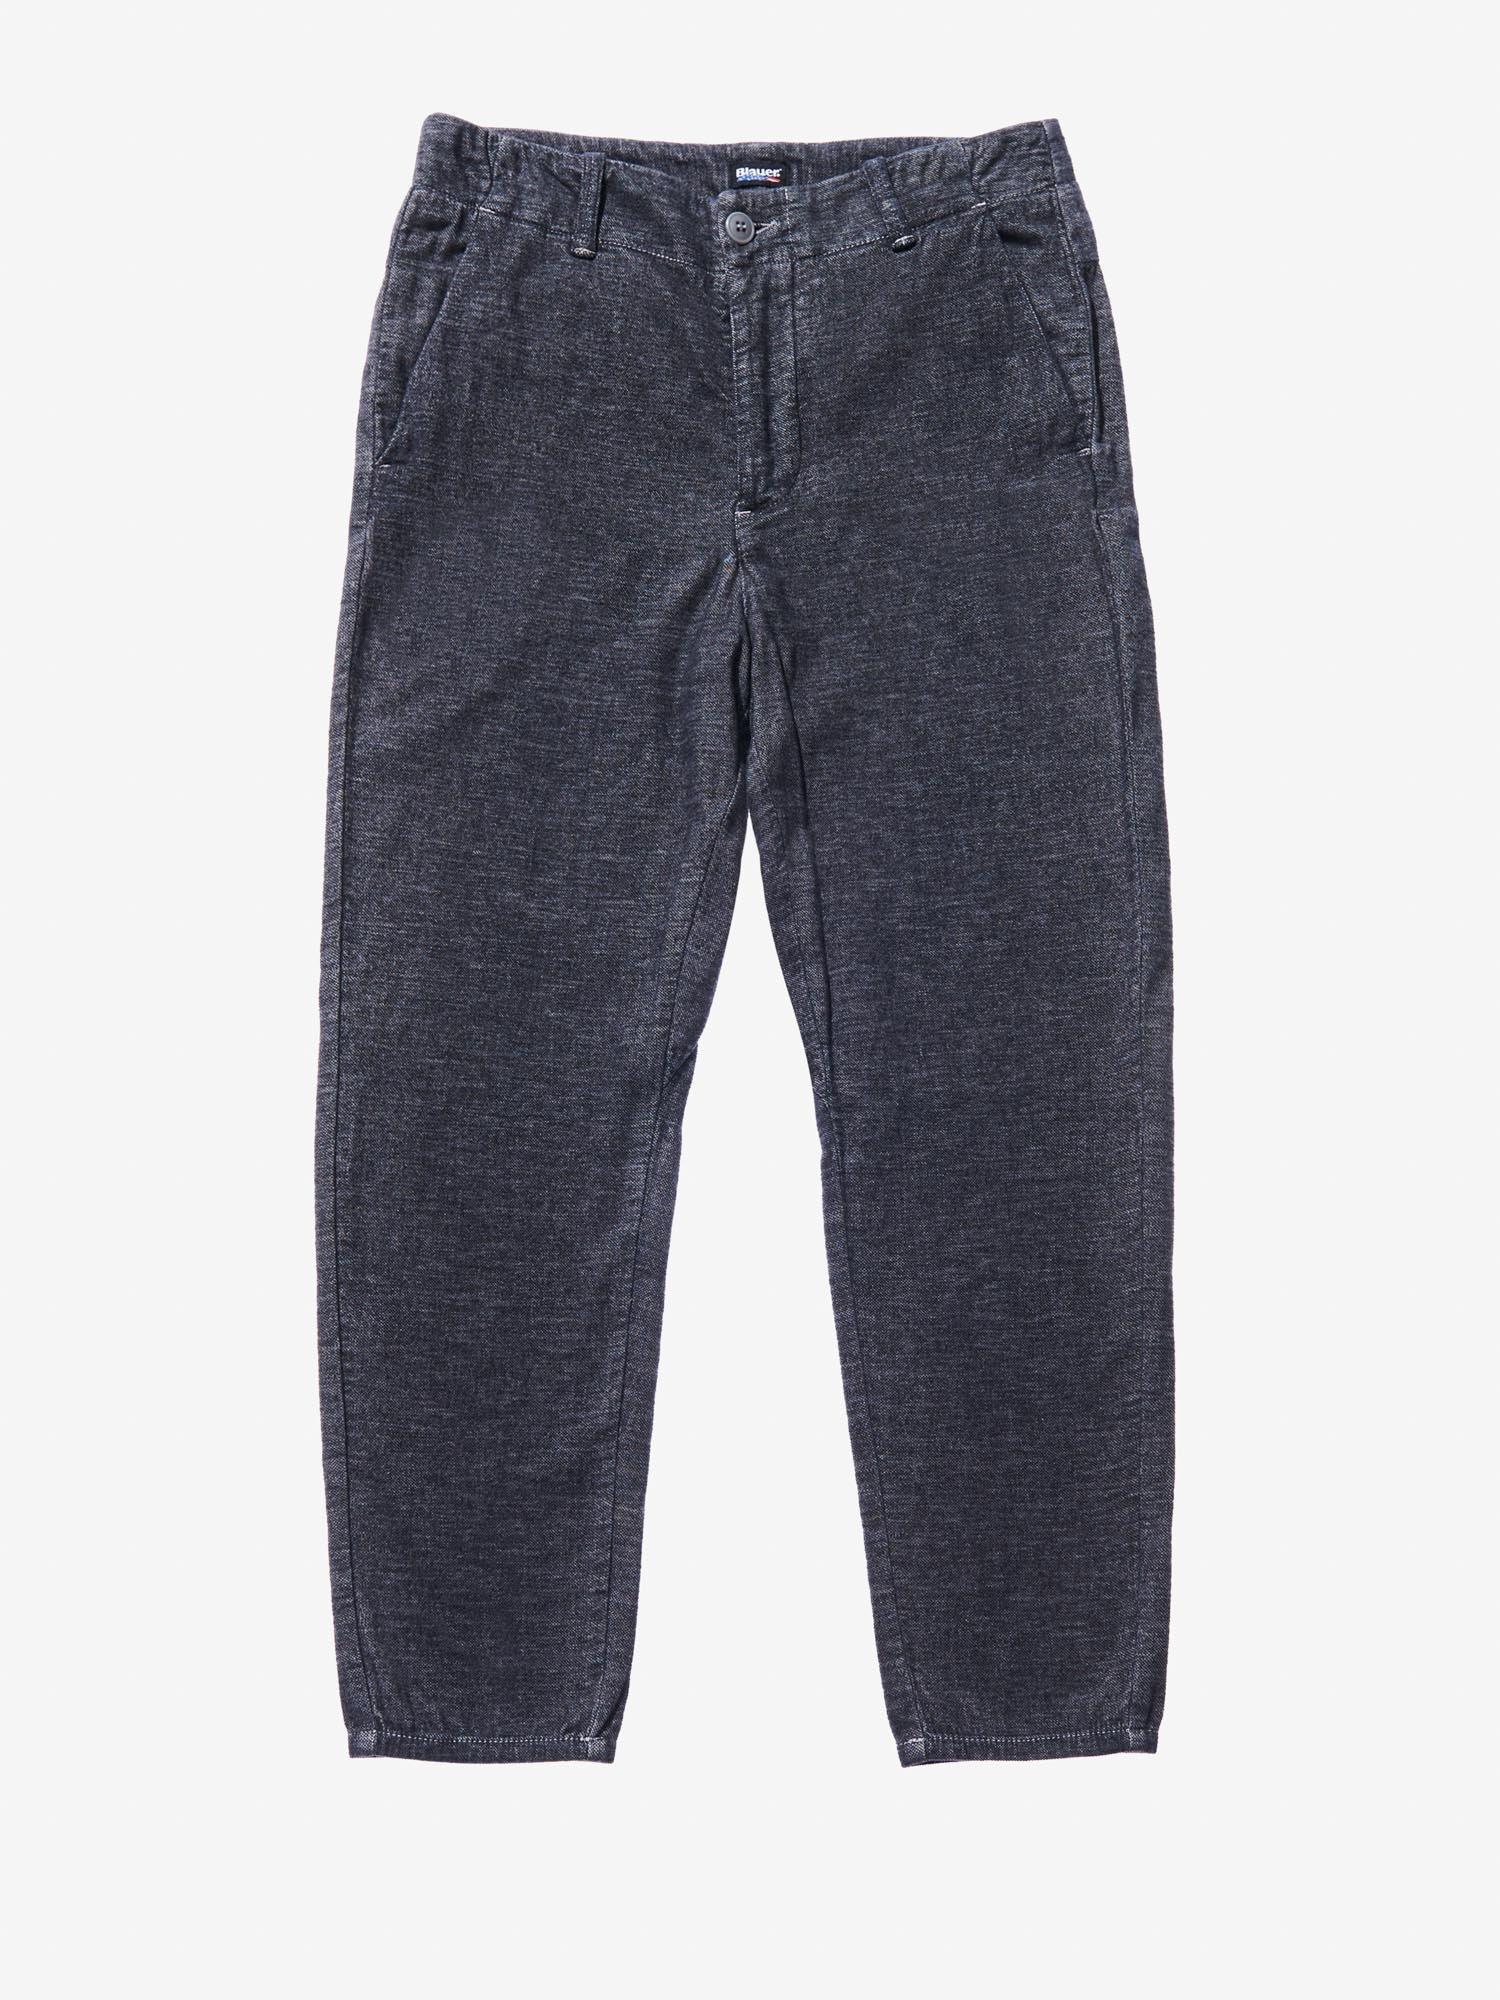 MELANGE PANTS - Blauer